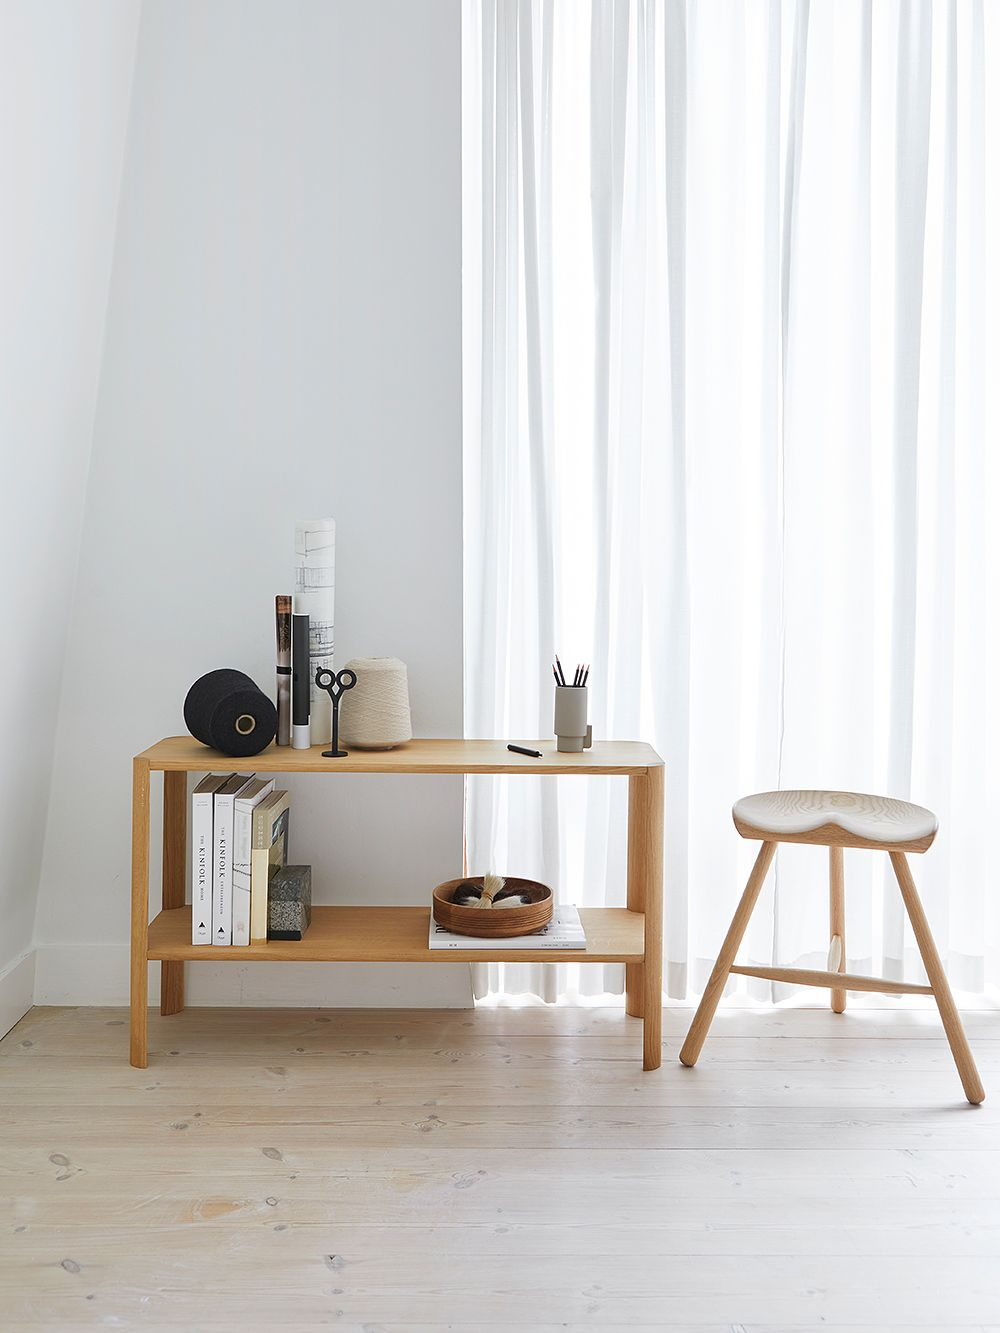 Form & Refine's Leaf shelf